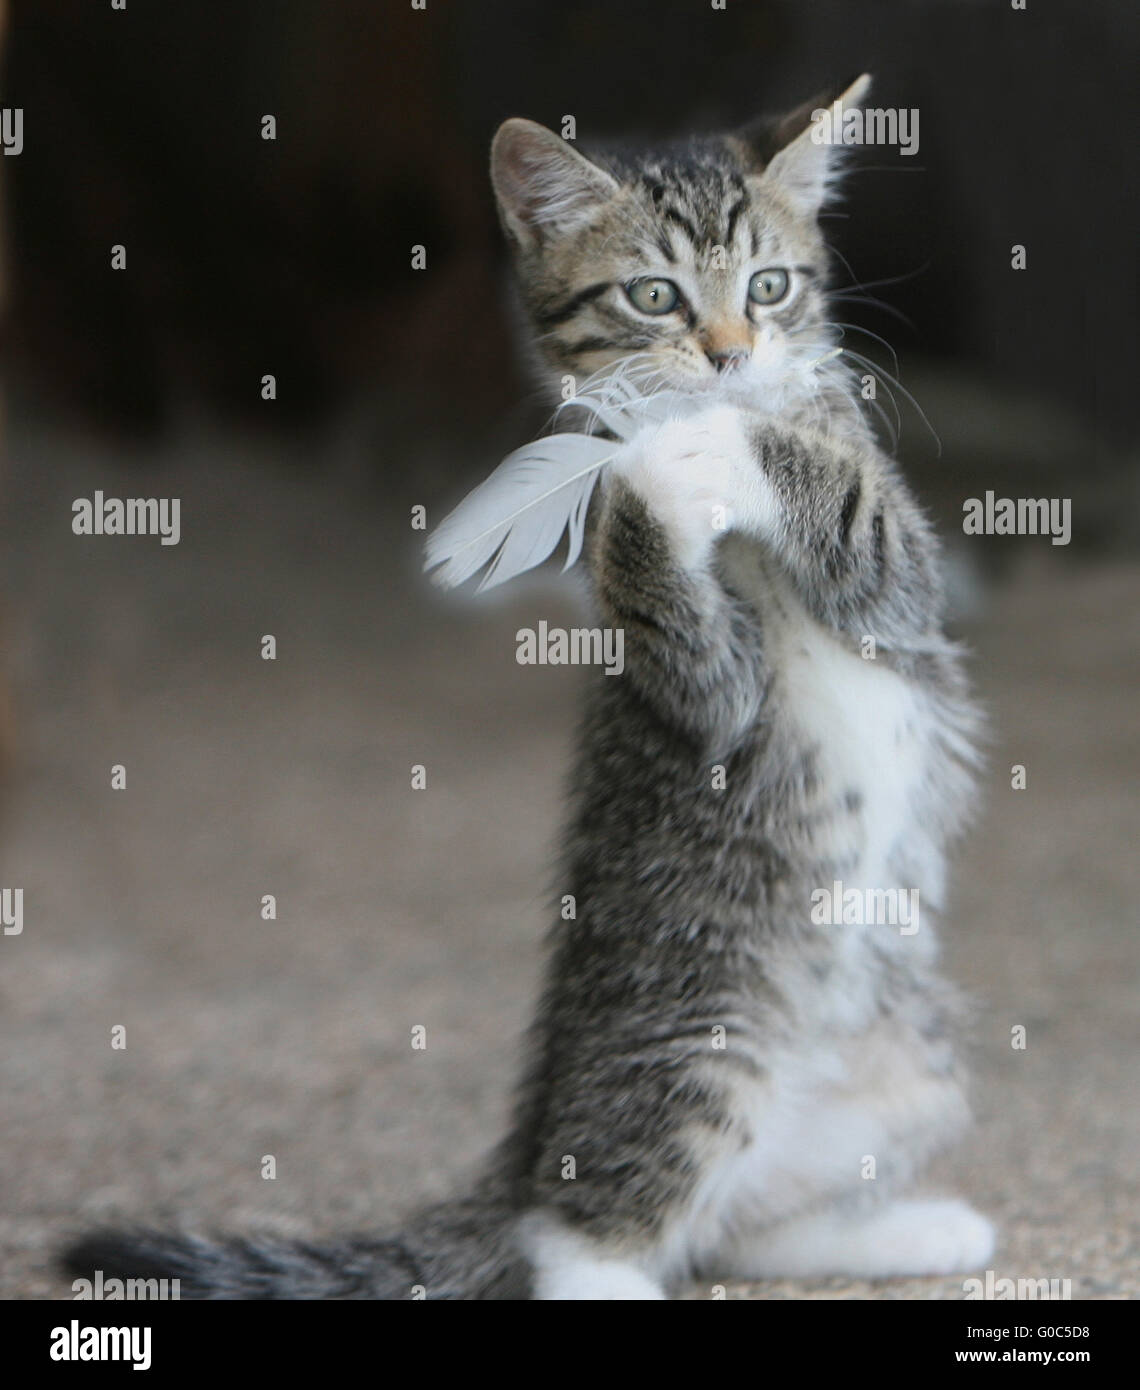 Baby Kitten - Stock Image